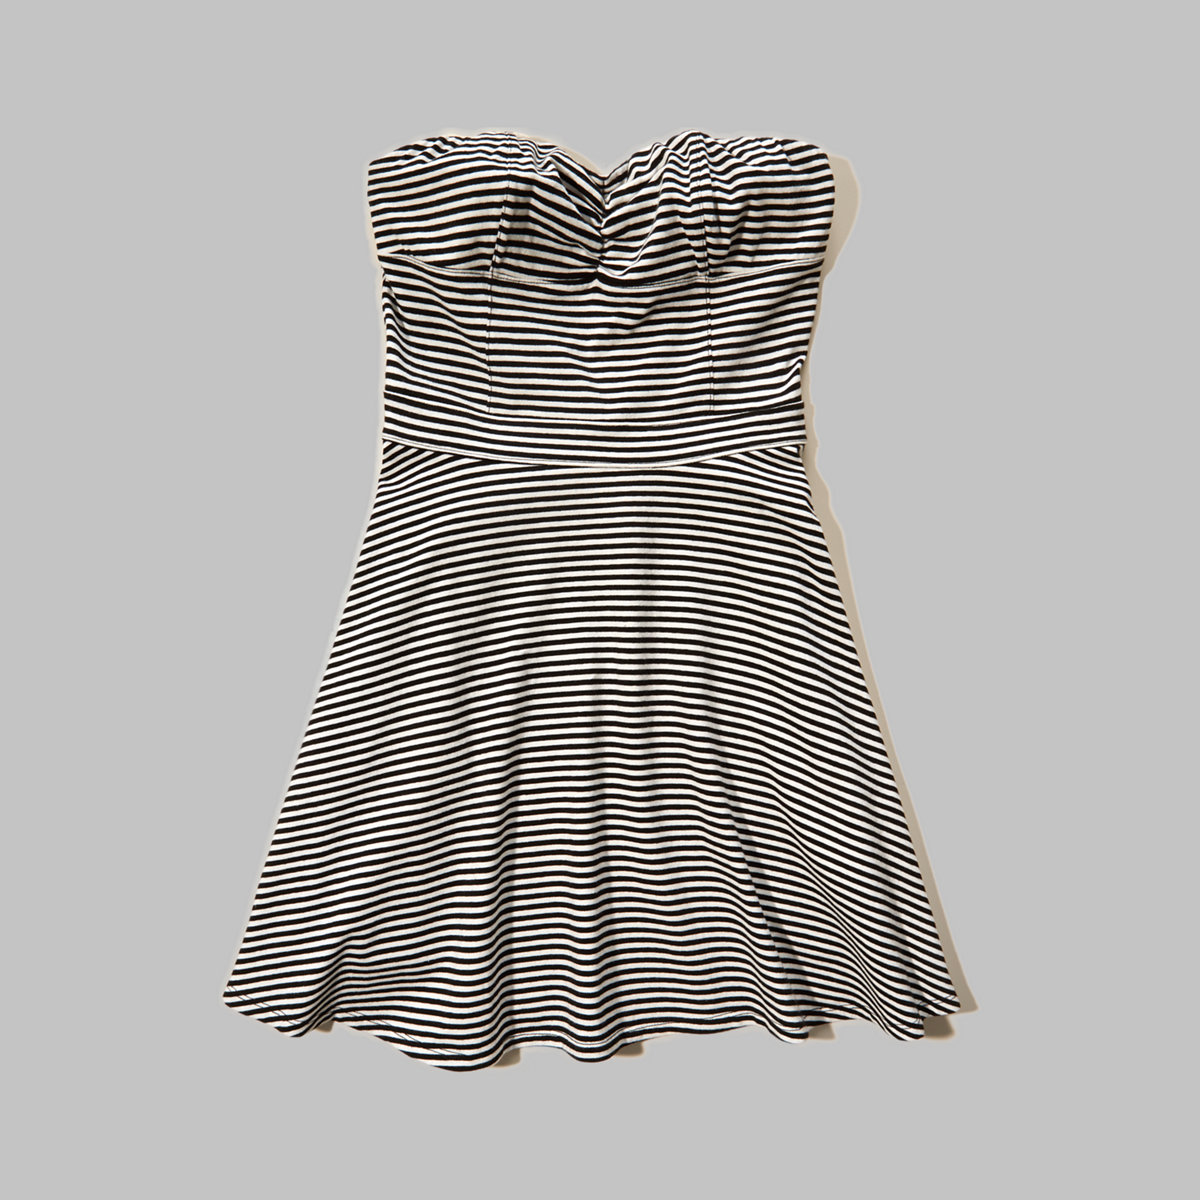 Strapless Knit Dress